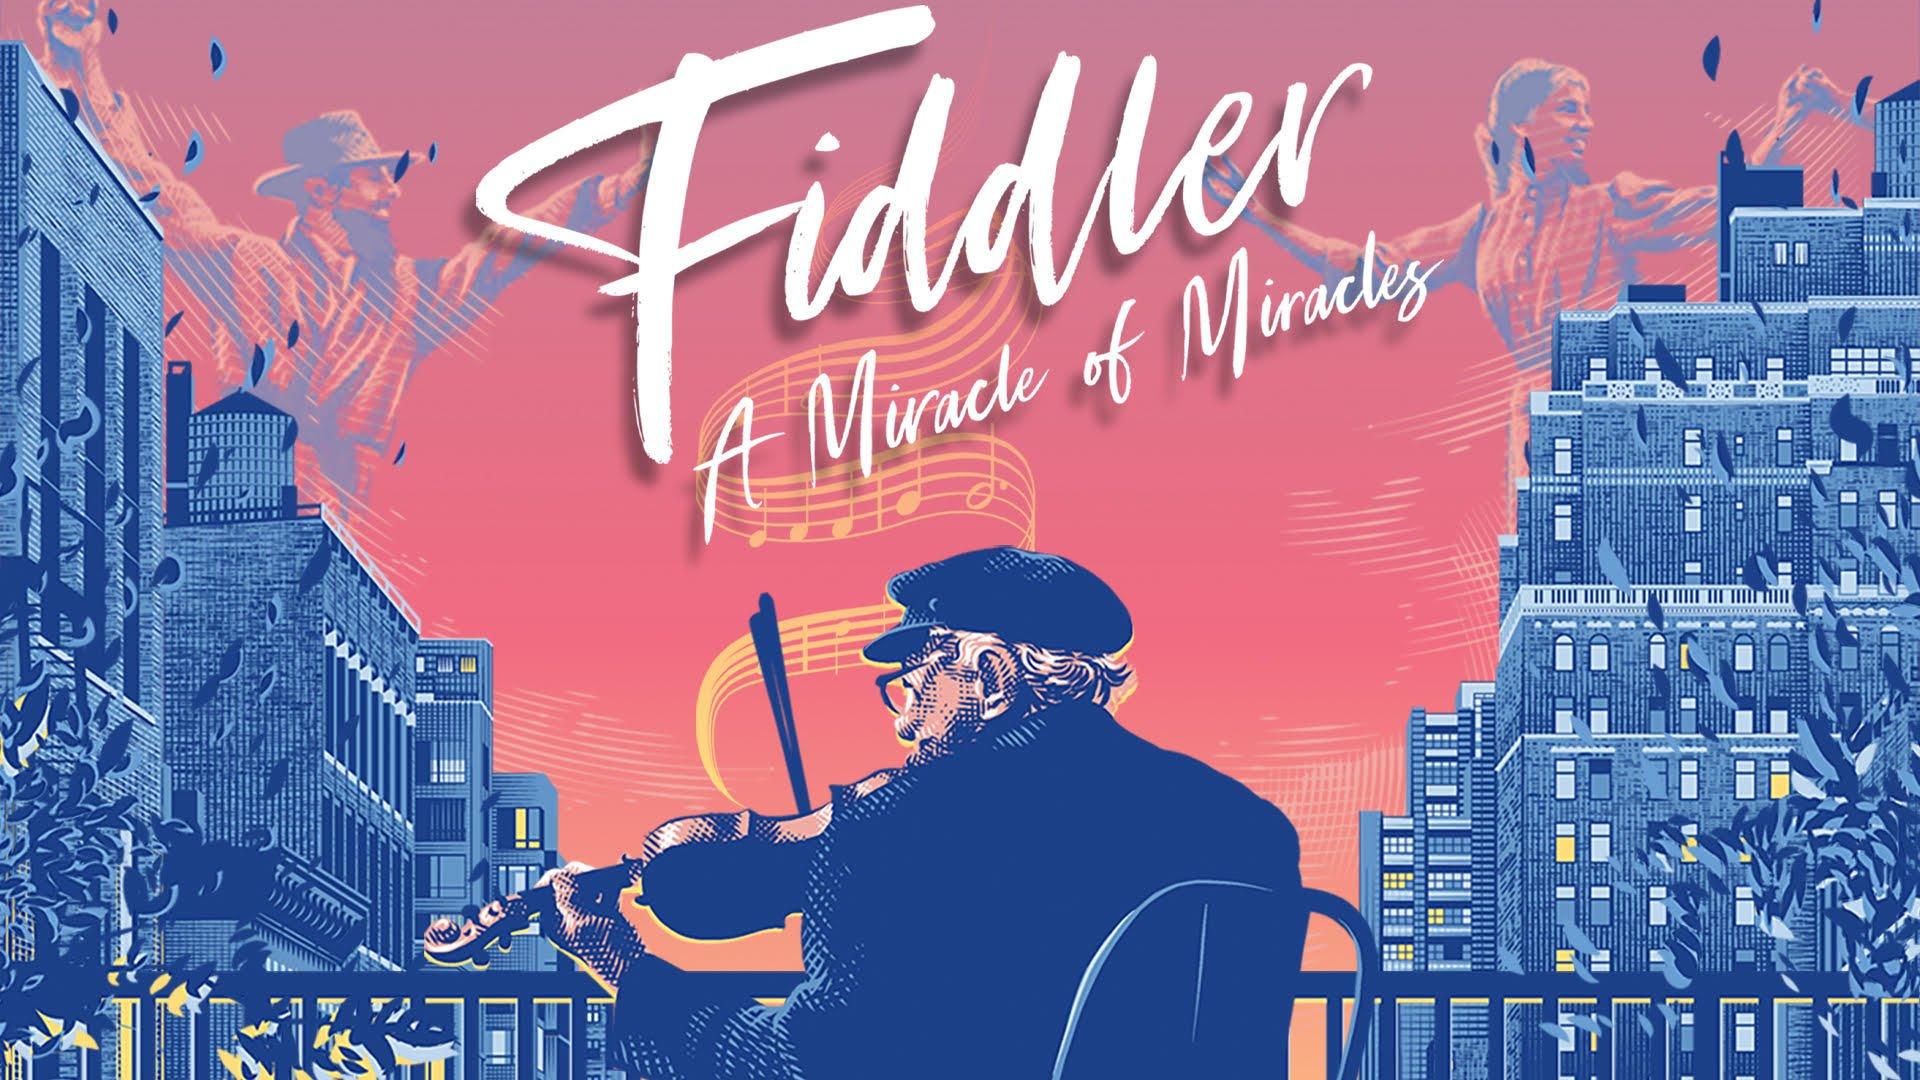 Fiddler - horizontal